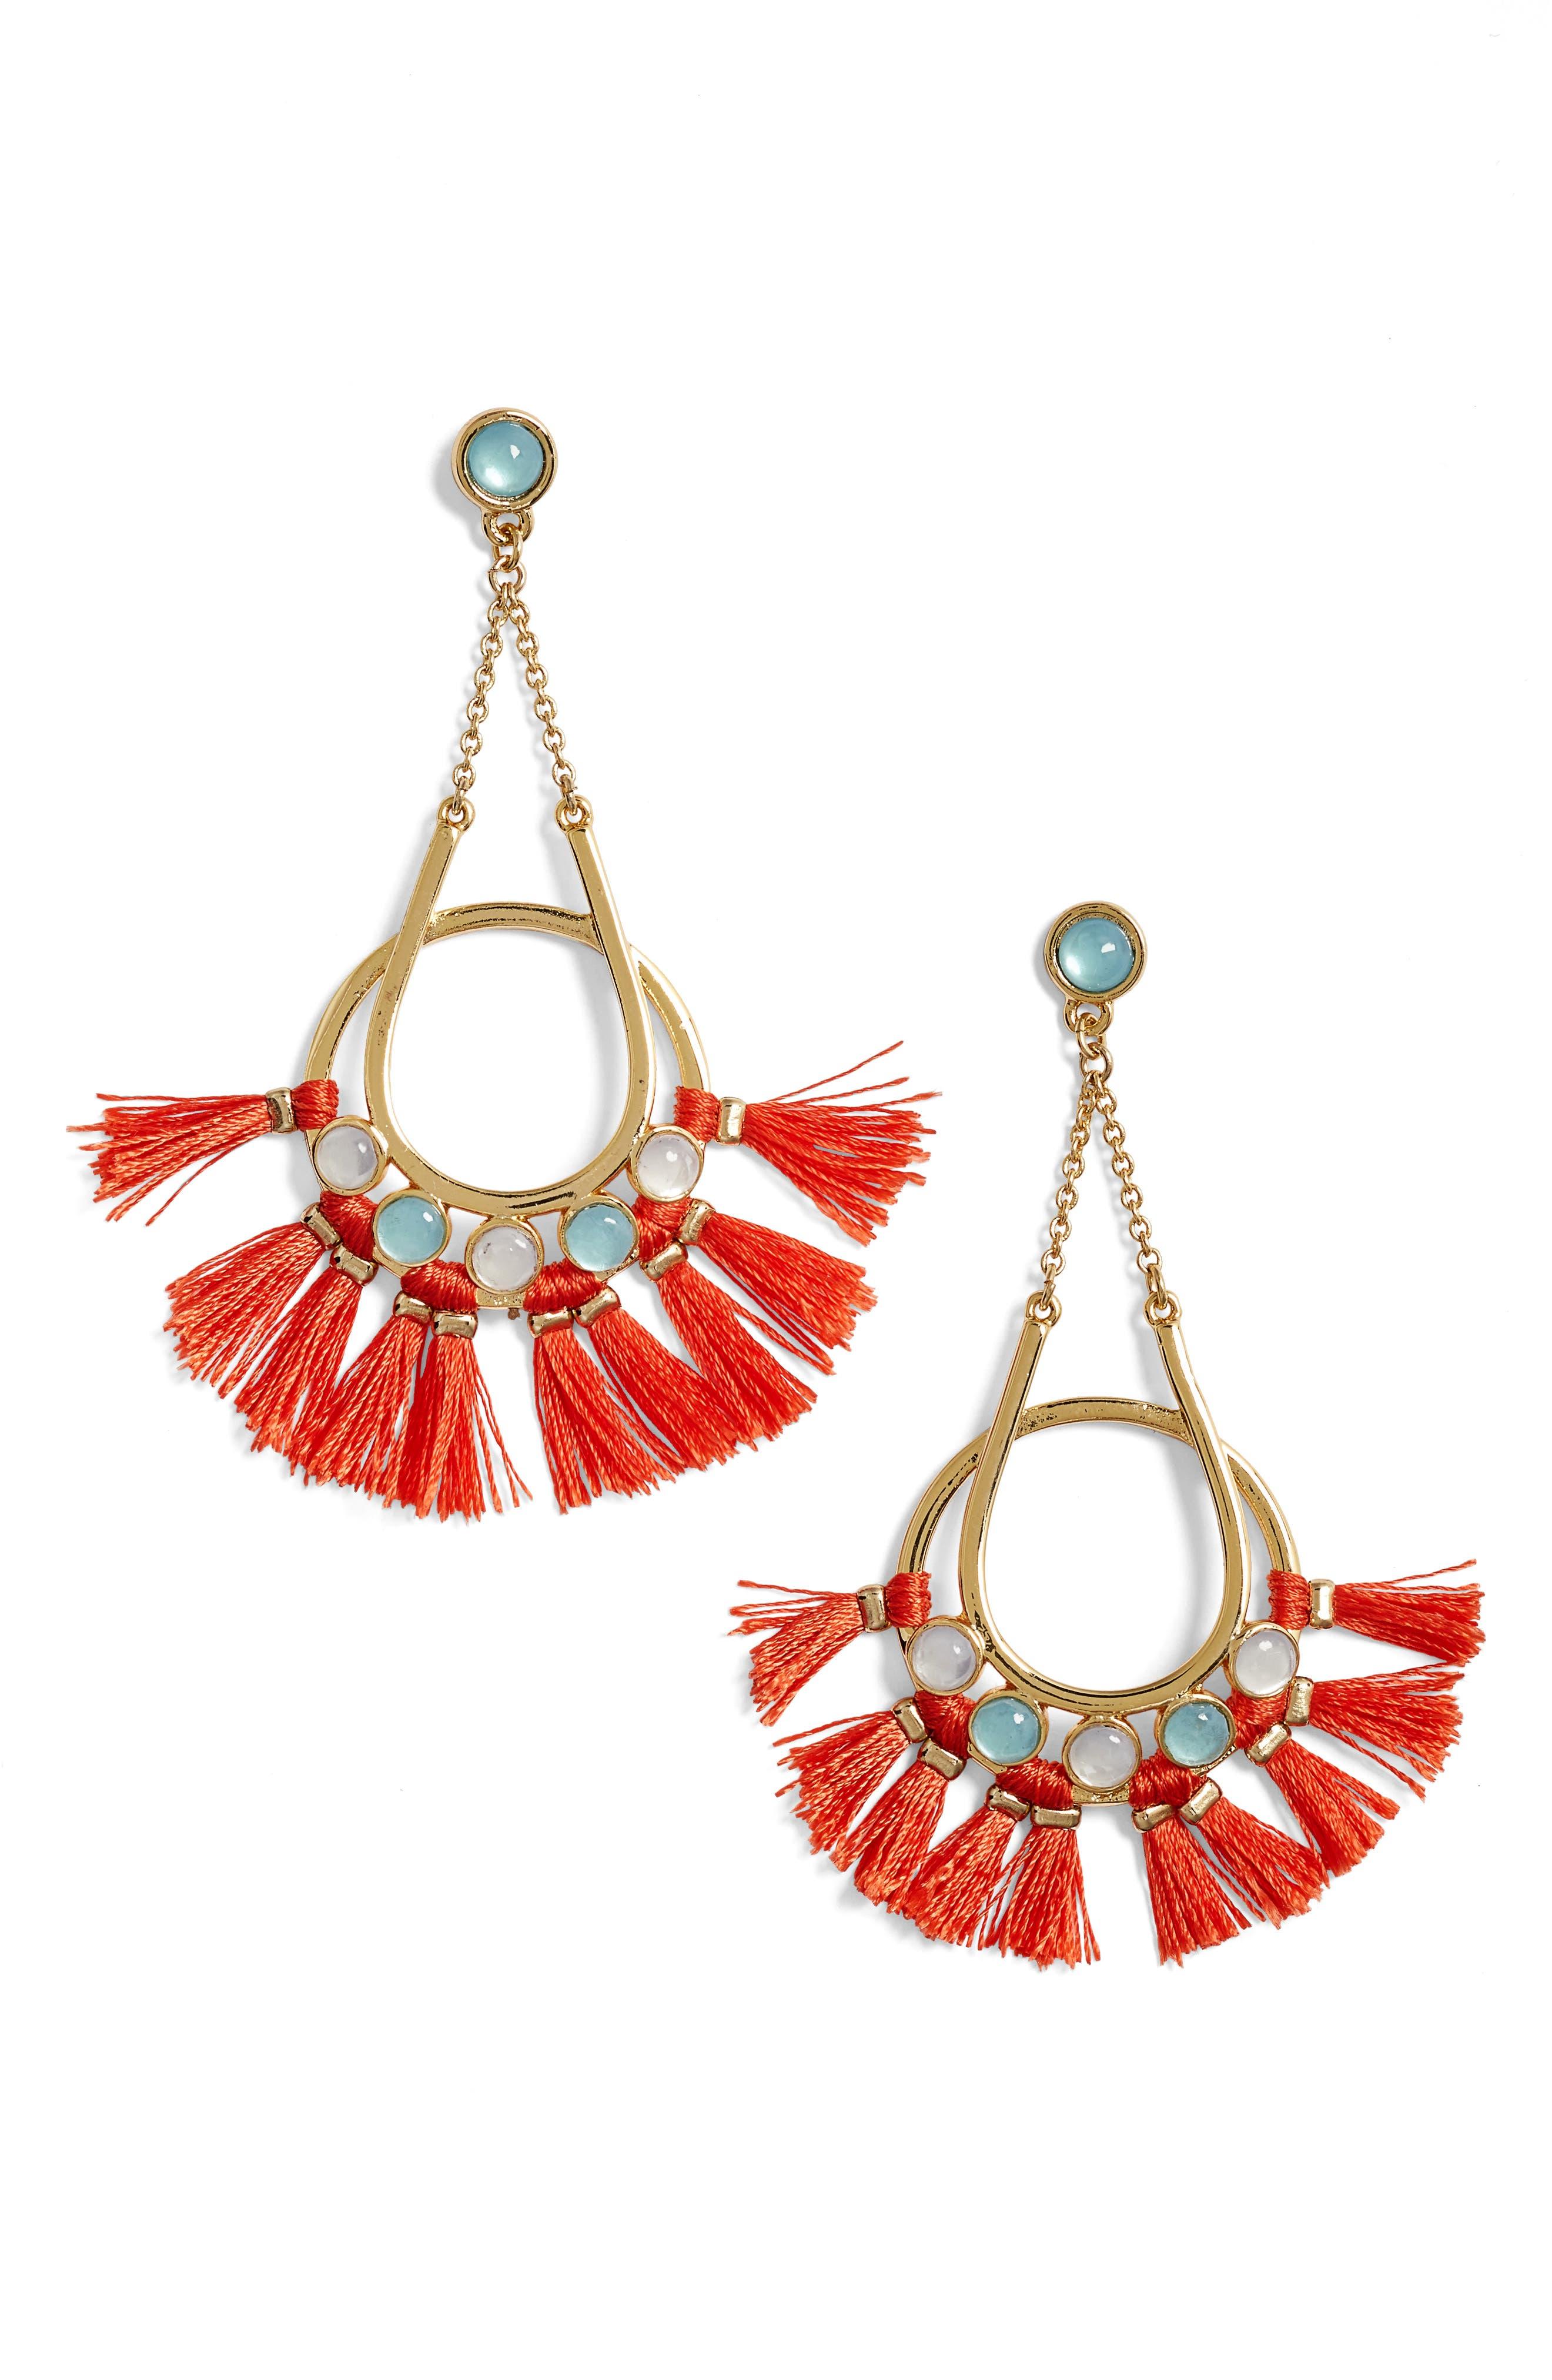 Utopia Tassel Chandelier Earrings,                         Main,                         color, Turquoise / Red